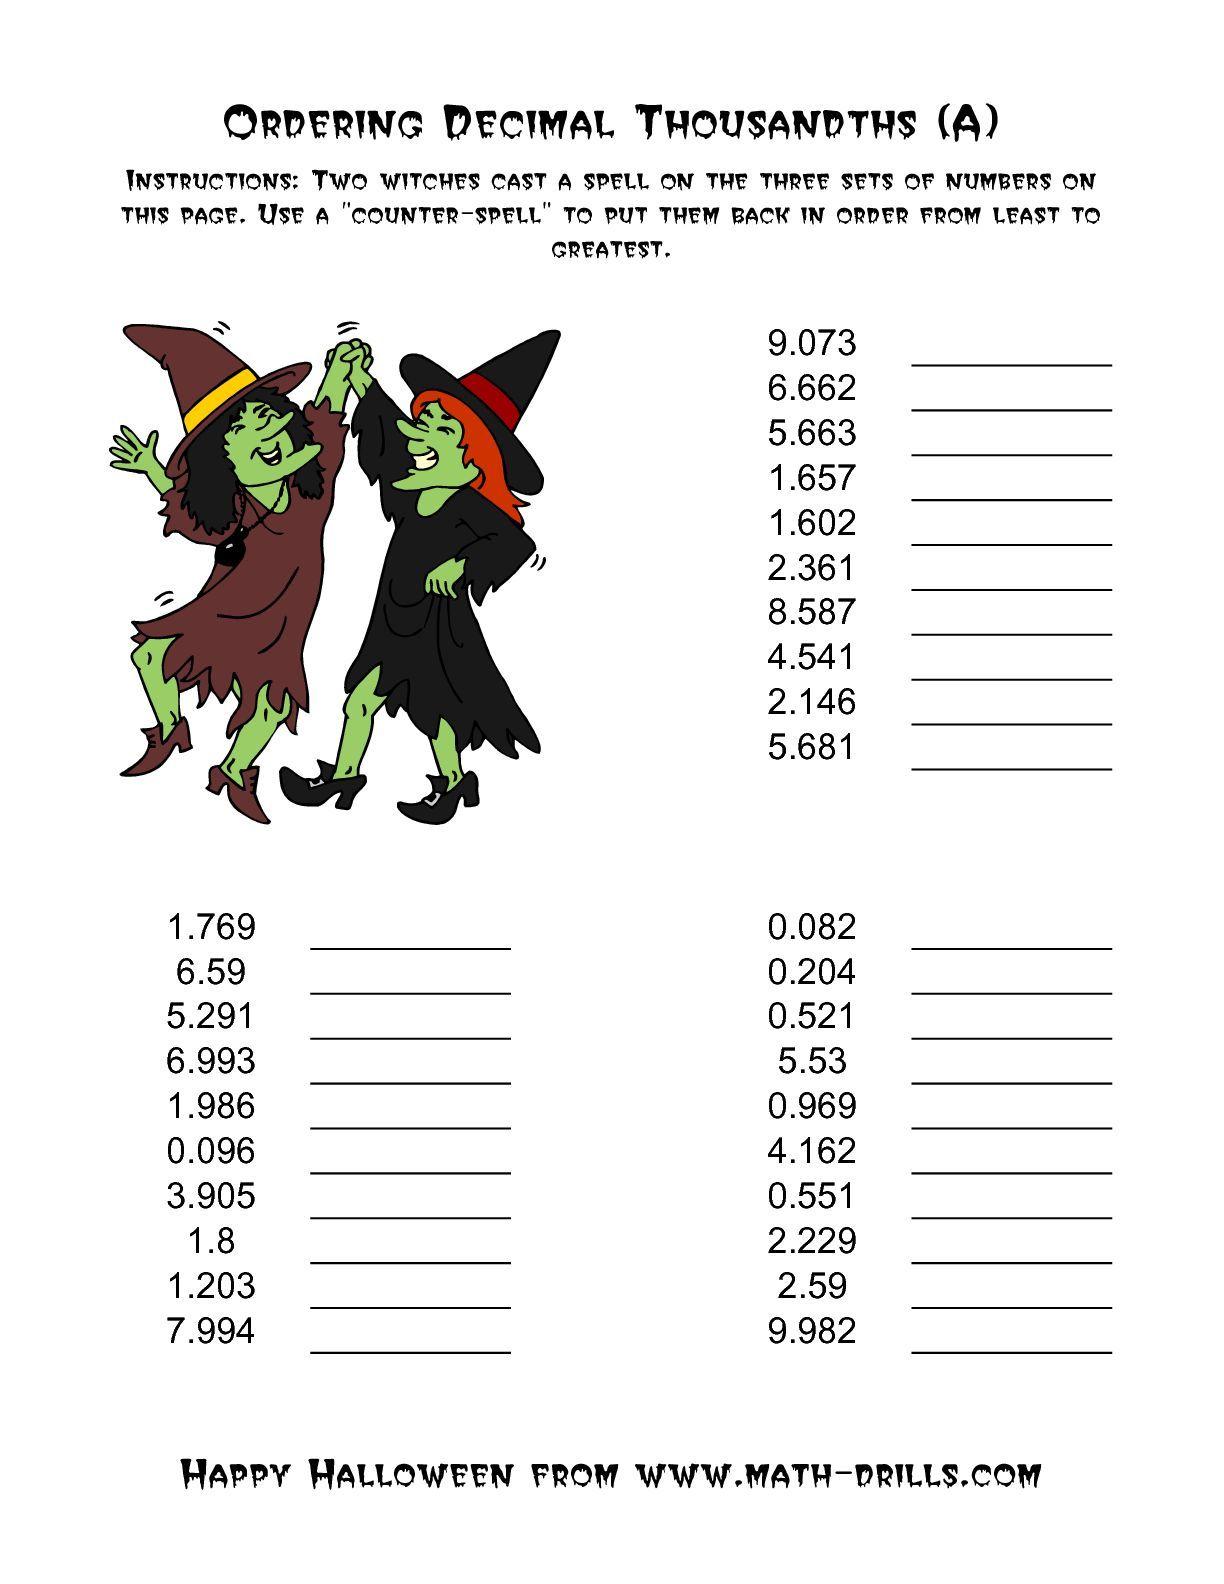 Witches Ordering Decimal Thousandths A Halloween Math Worksheet Ordering Decimals Halloween Math Worksheets Decimals [ 1584 x 1224 Pixel ]